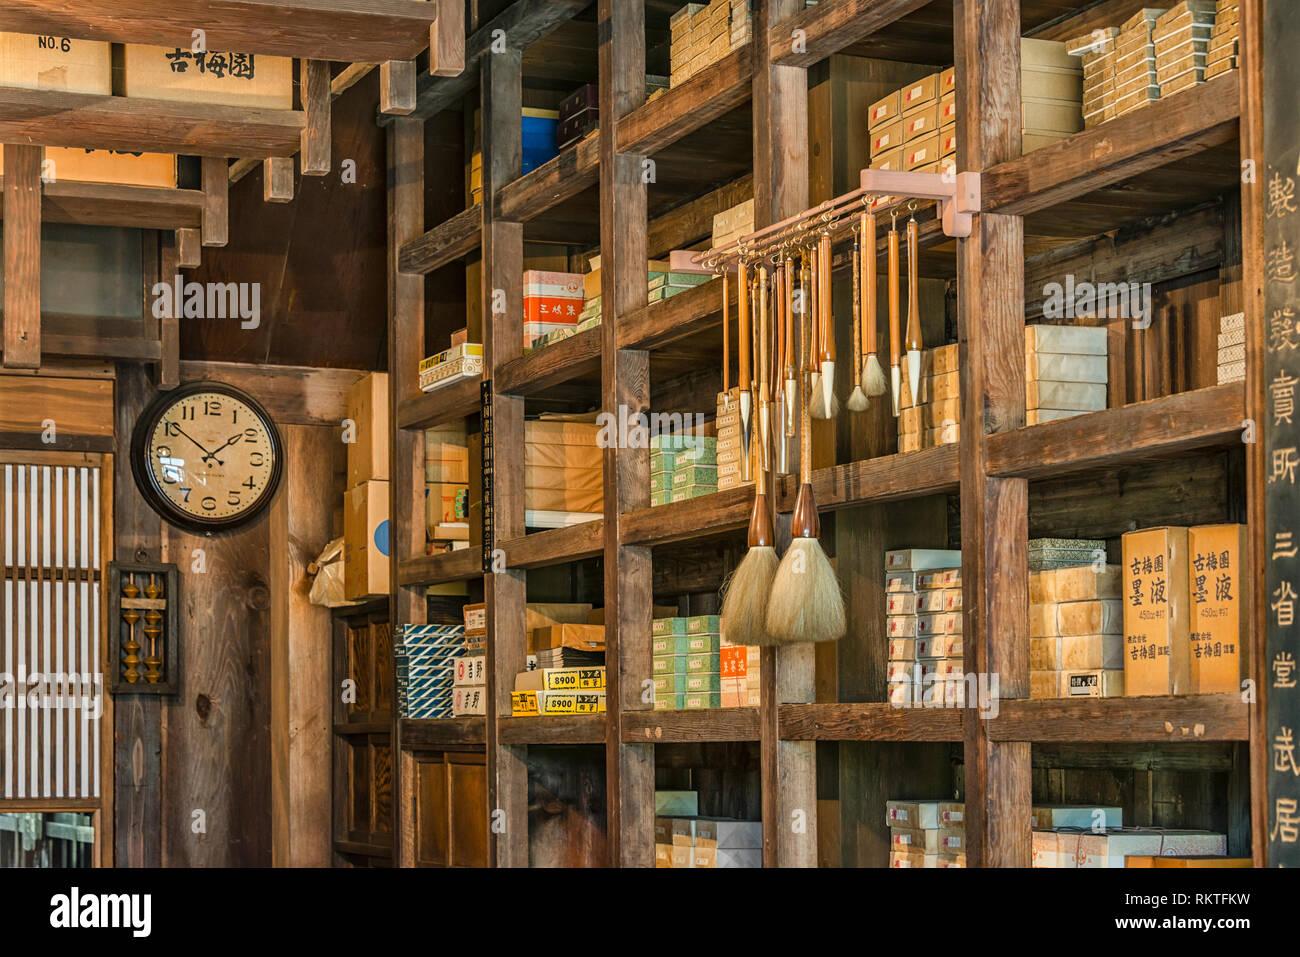 Interior of a ancient Japanese Stationary store 'Takai Sanshodo'at Edo Tokyo Open Air Museum, Japan   Innenaufnahme alten Japanischen Schreibwarenlade - Stock Image